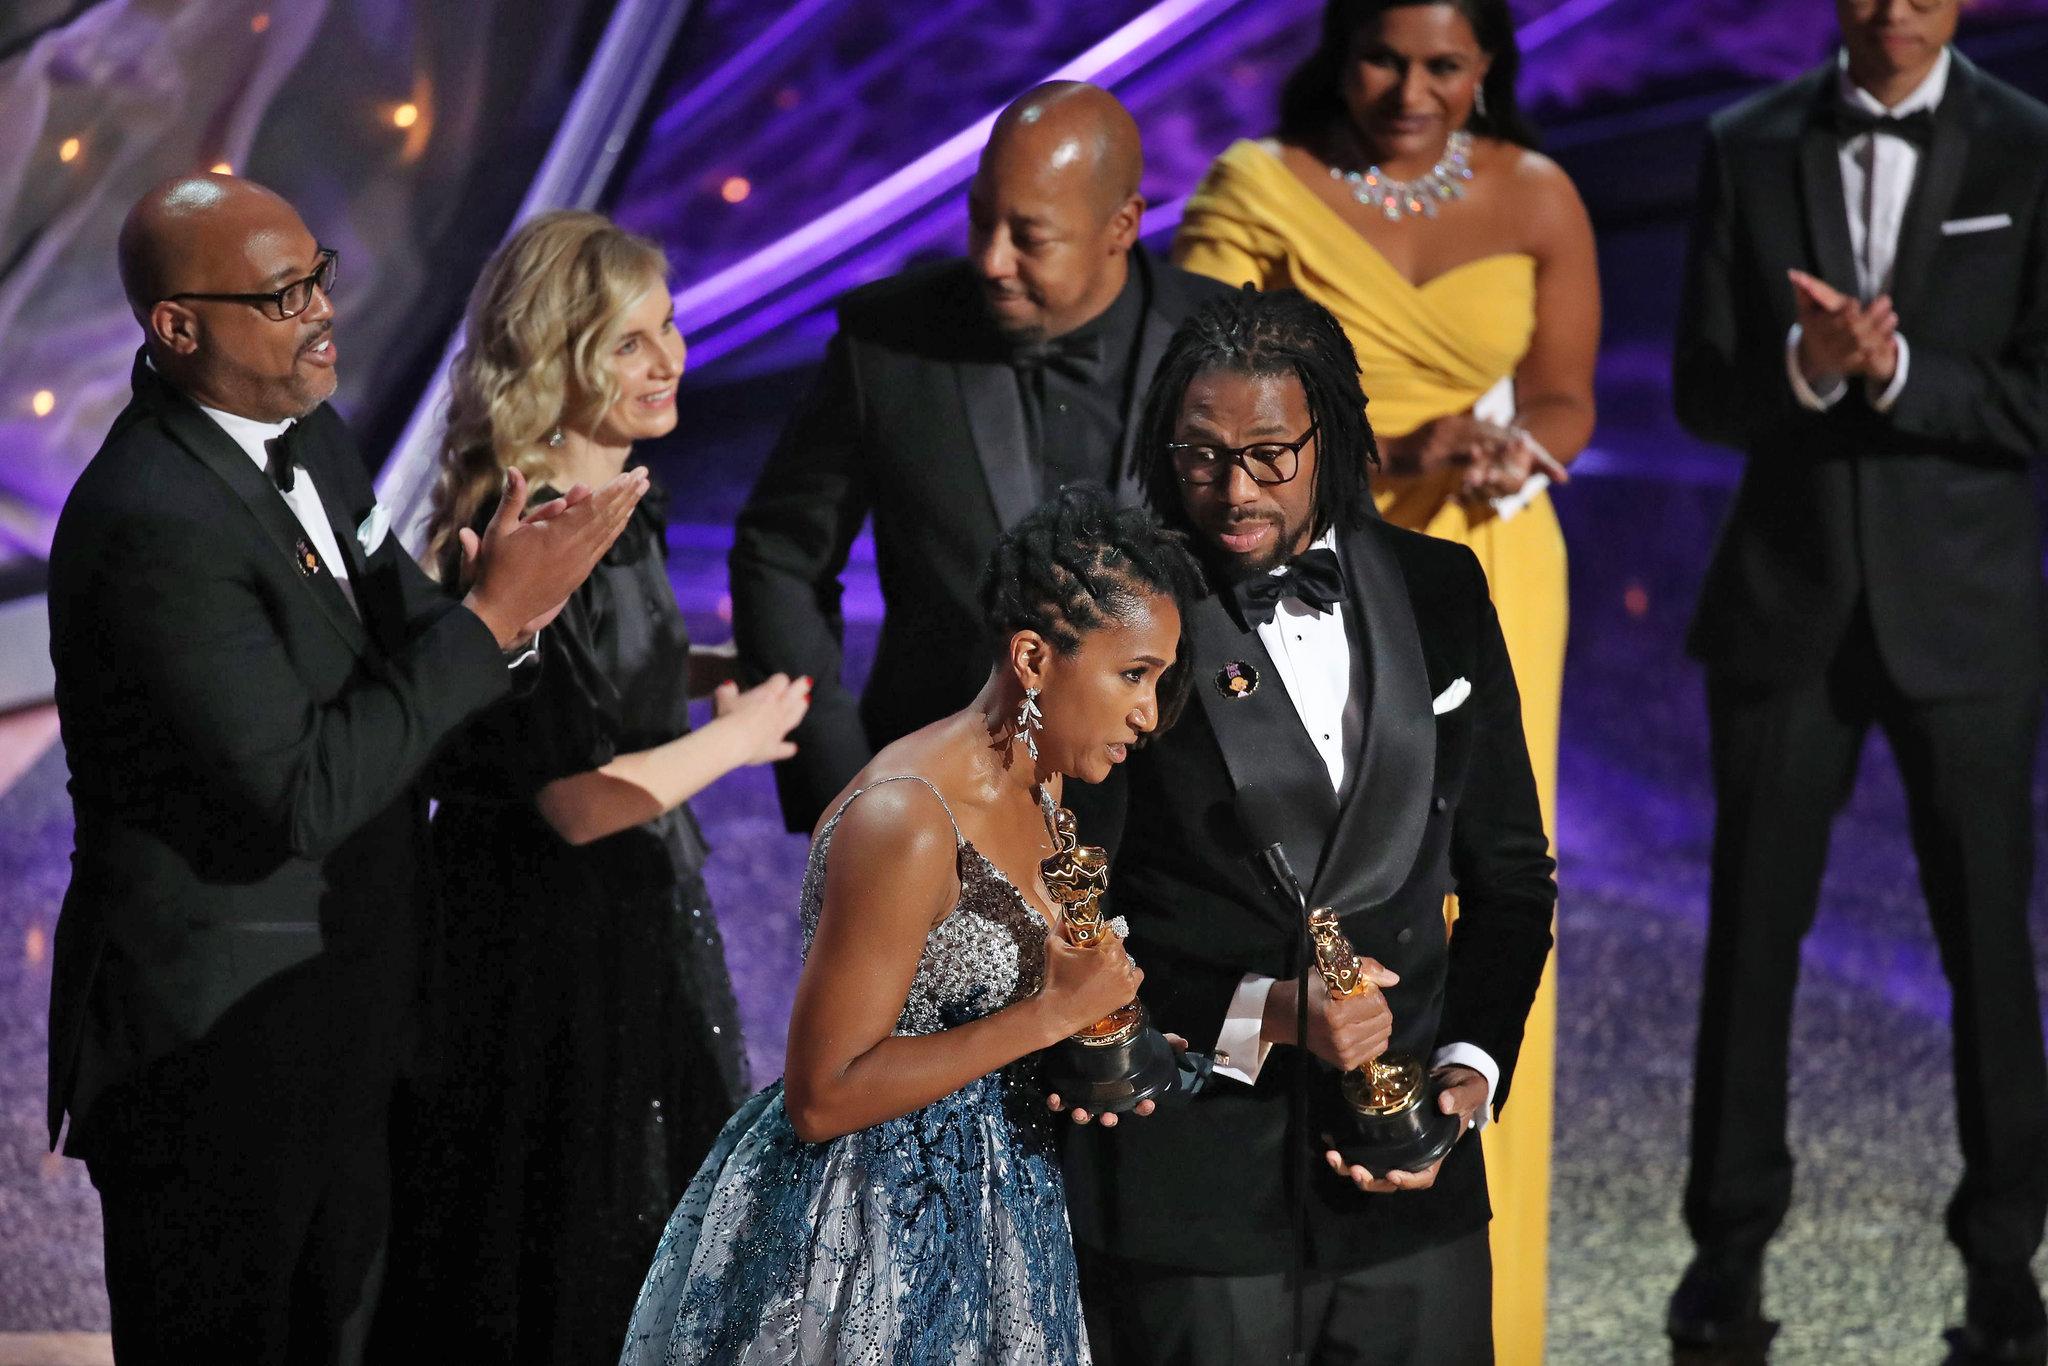 Oscars 2020: The Complete Winners List